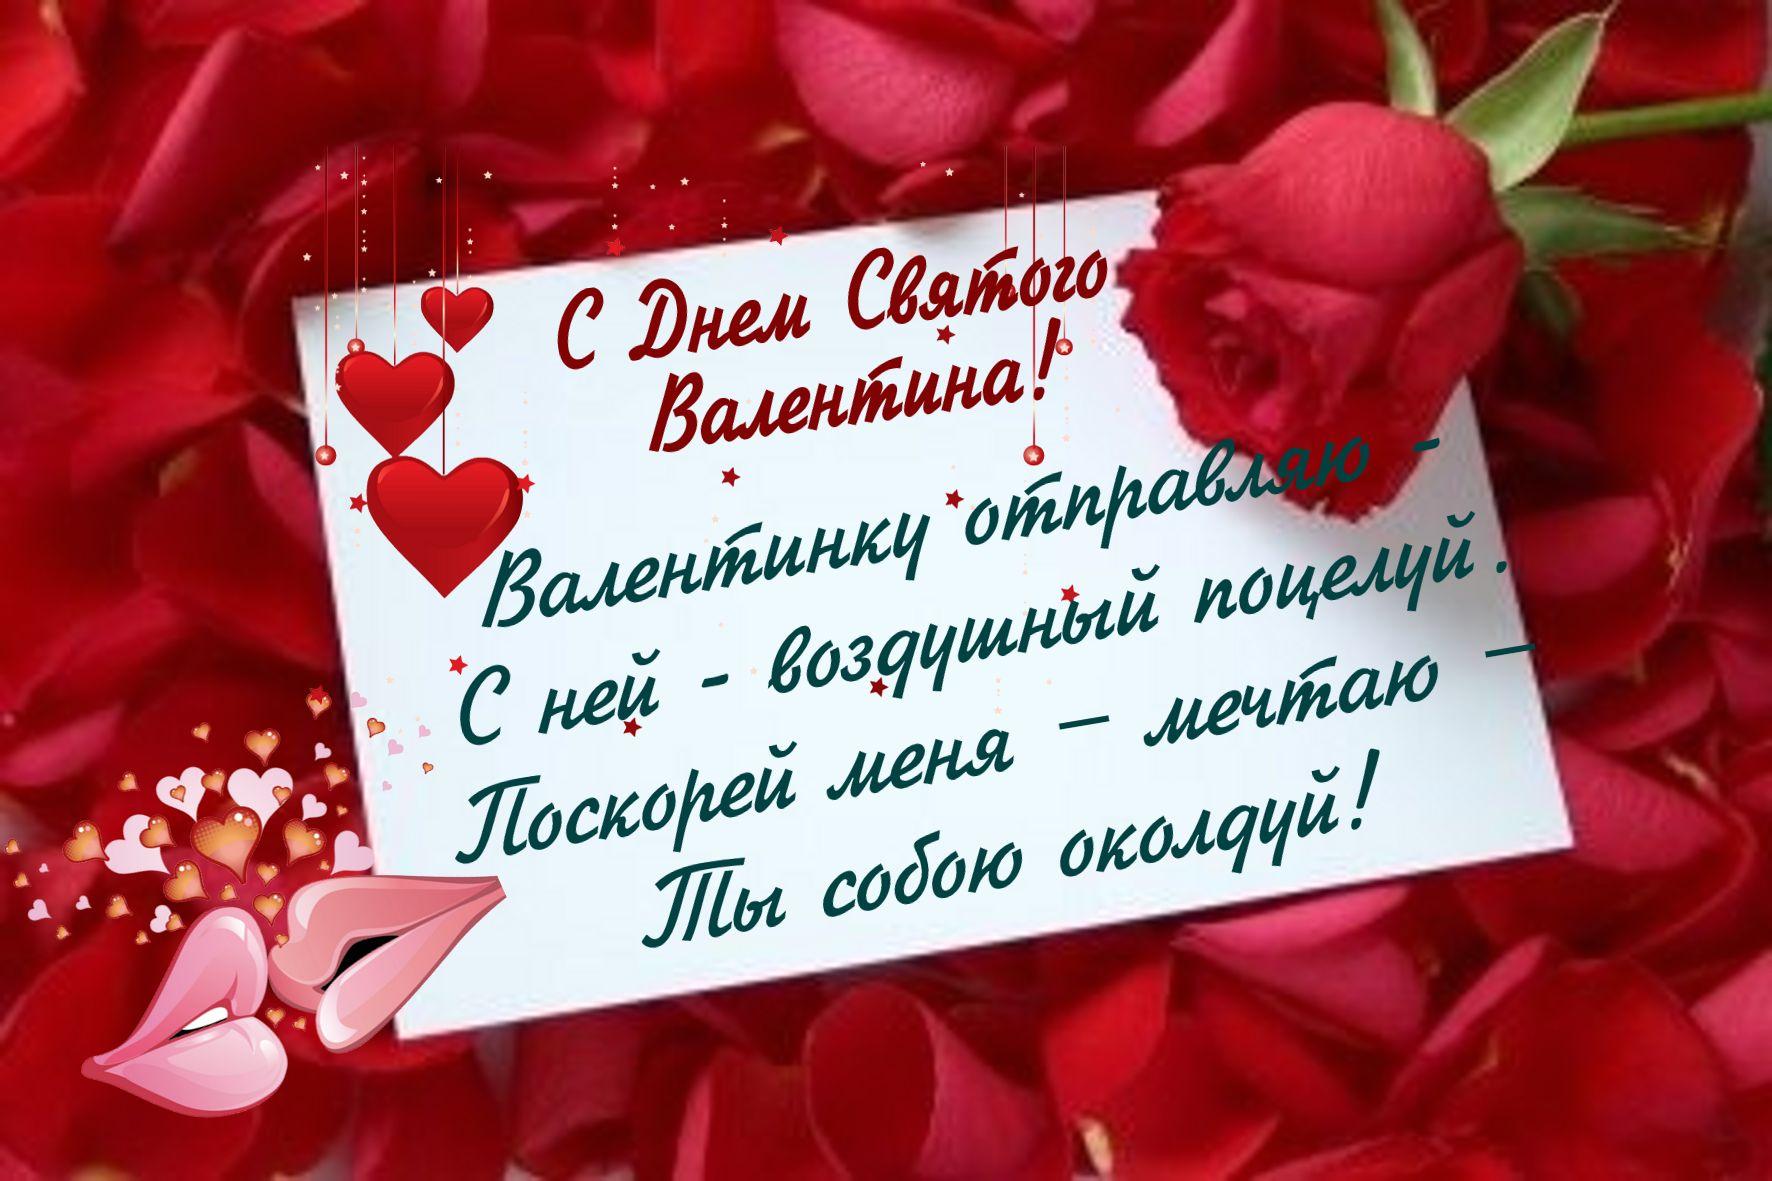 валентинка с розой: www.pra3dnuk.ru/news/den_svjatogo_valentina_den_vsekh_vljublennykh...